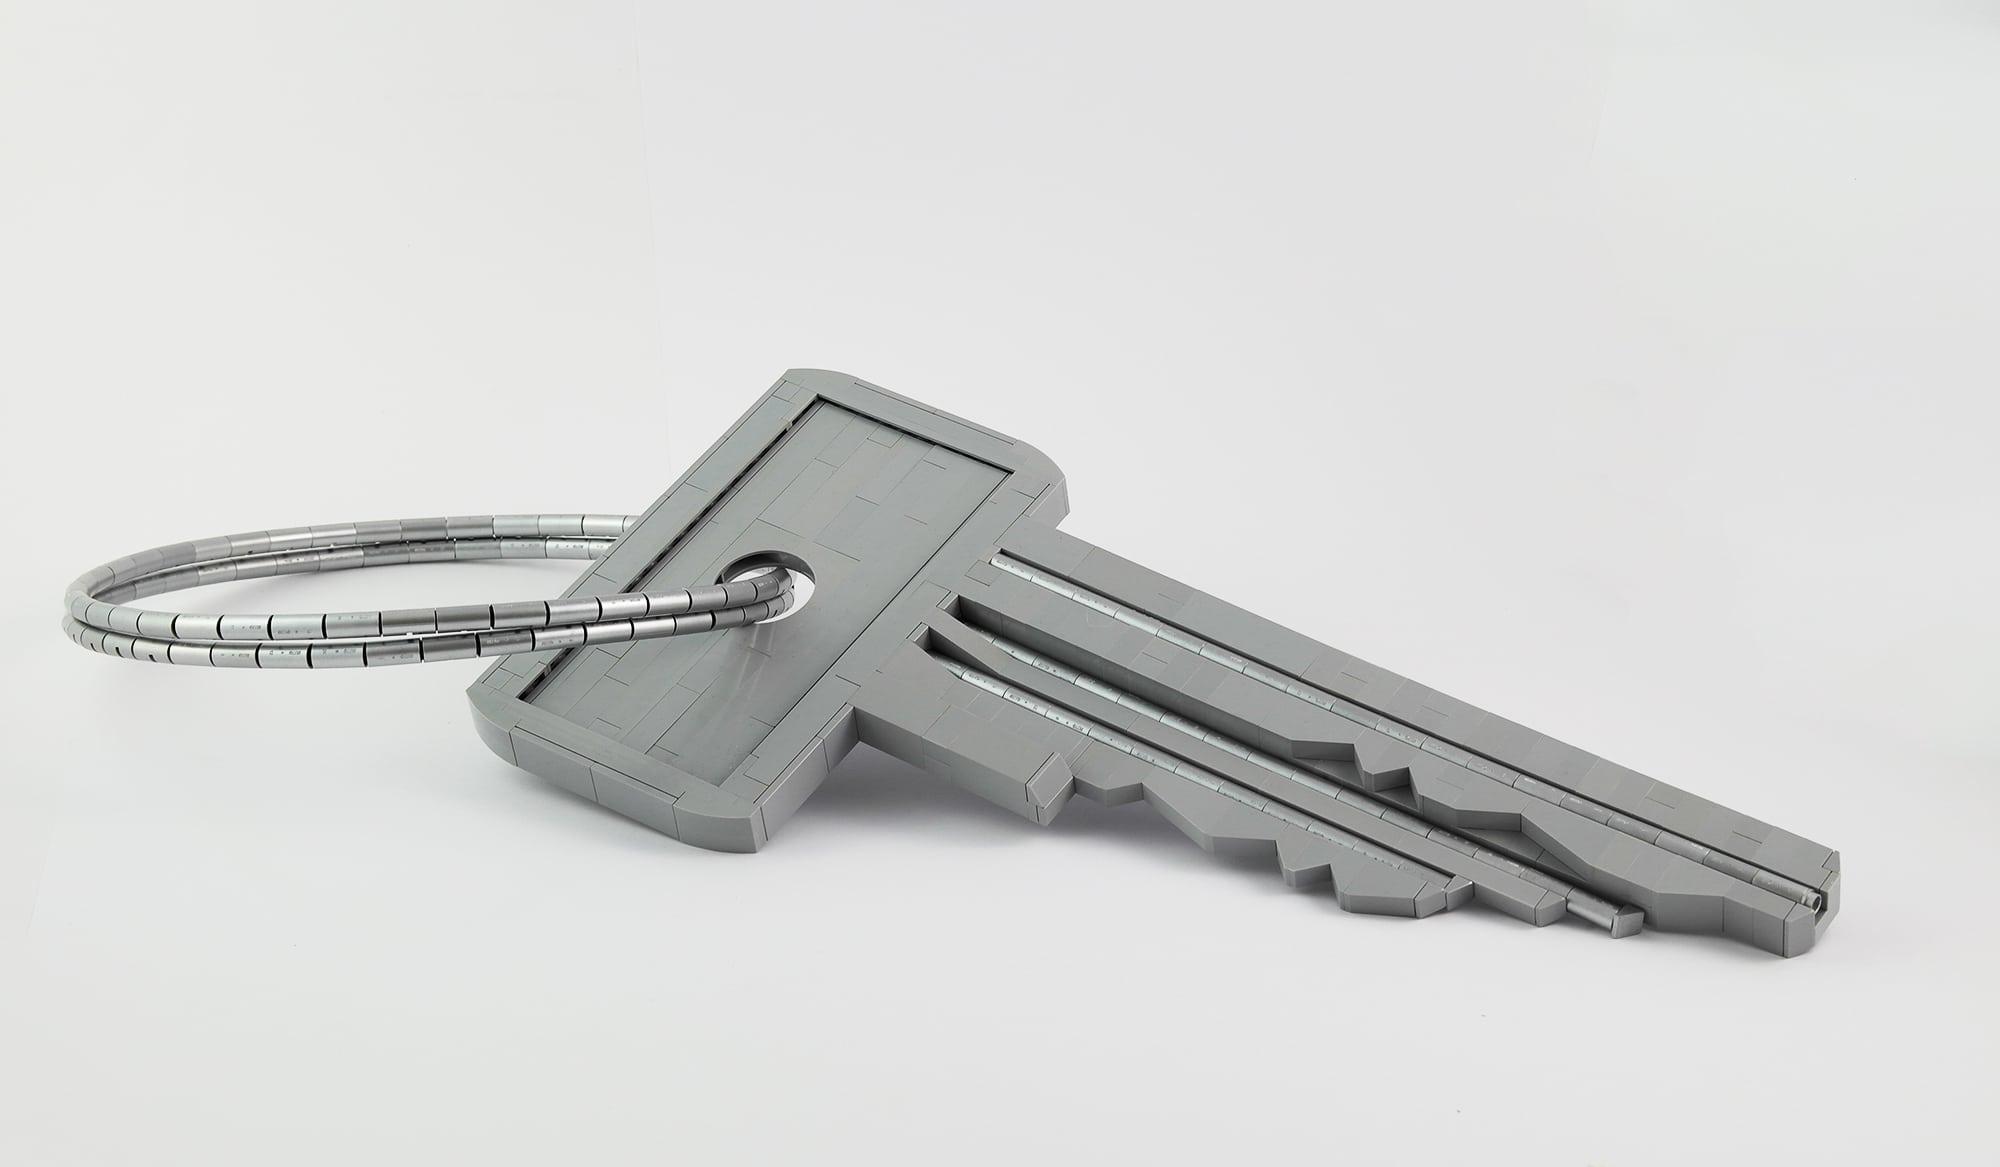 LEGO Moc Iron Builder 2016 Schluessel